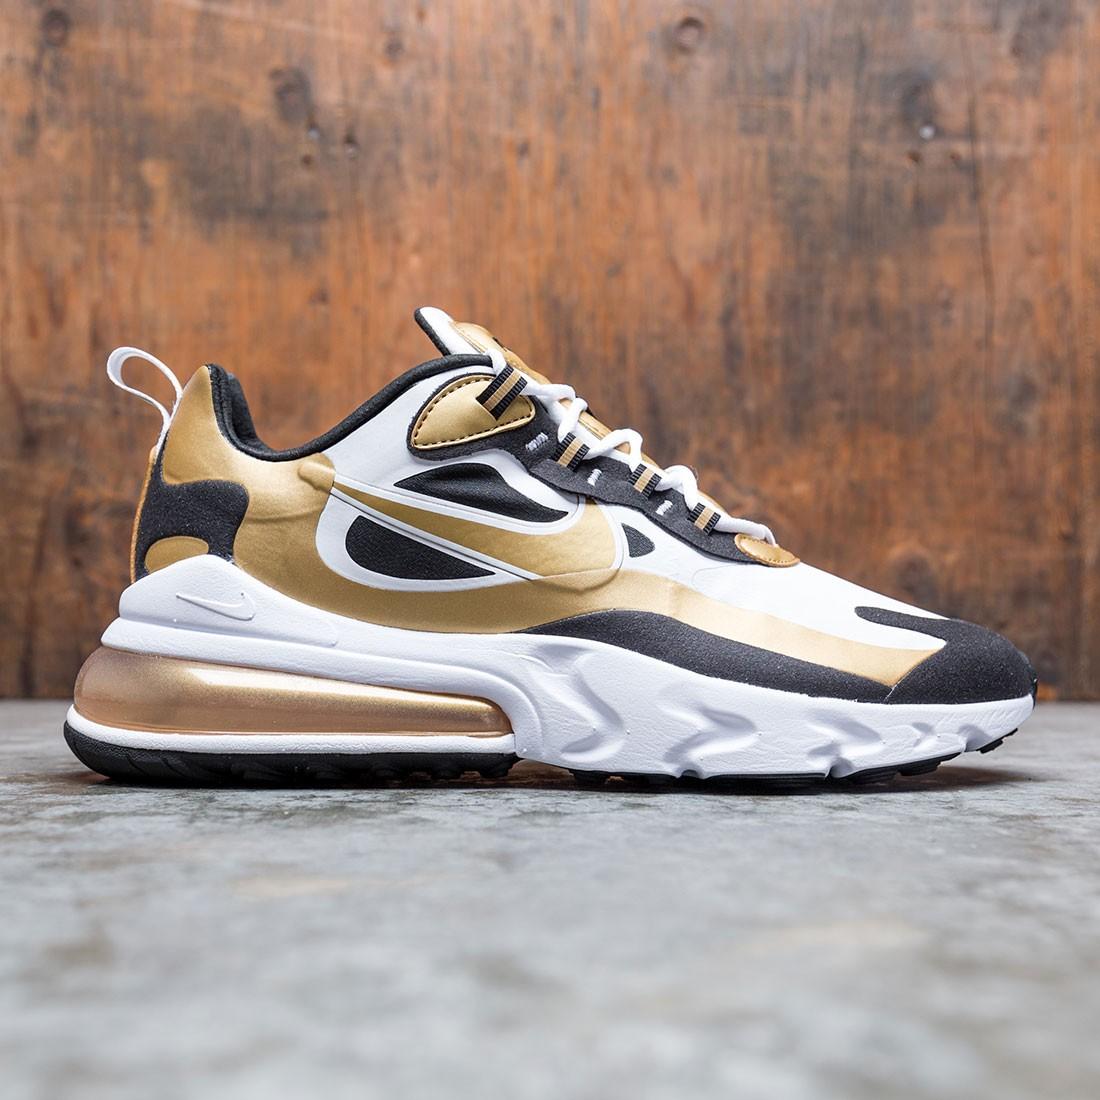 Nike Men Air Max 270 React (white / metallic gold-black)